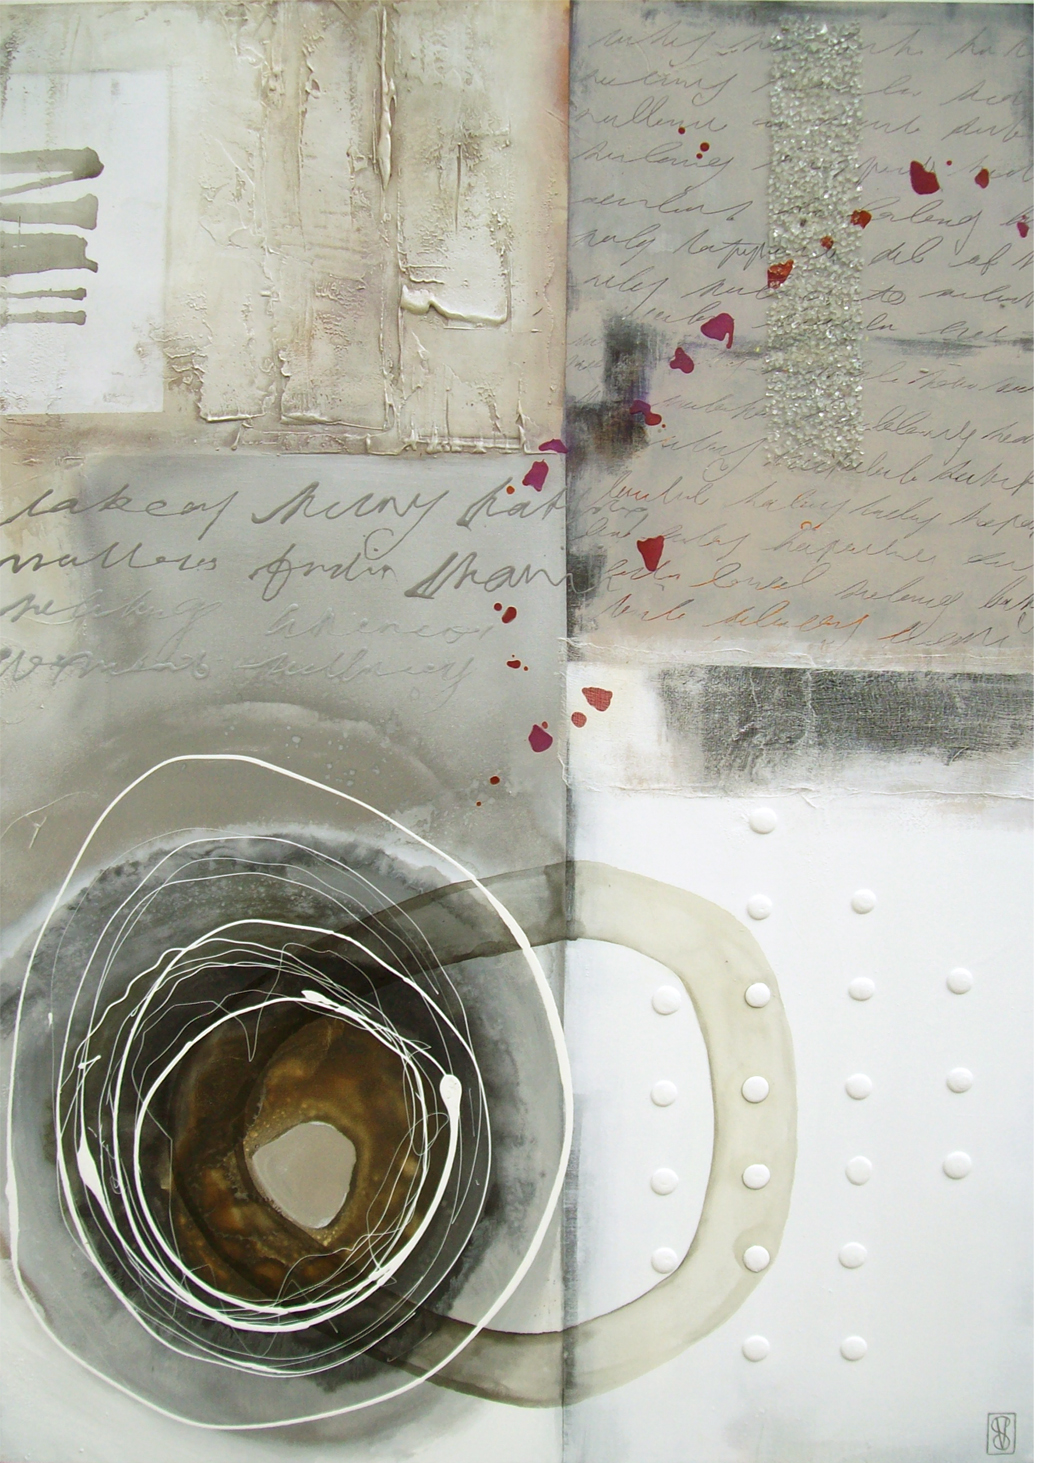 Vicky Sanders Abstract - Soap Treasure